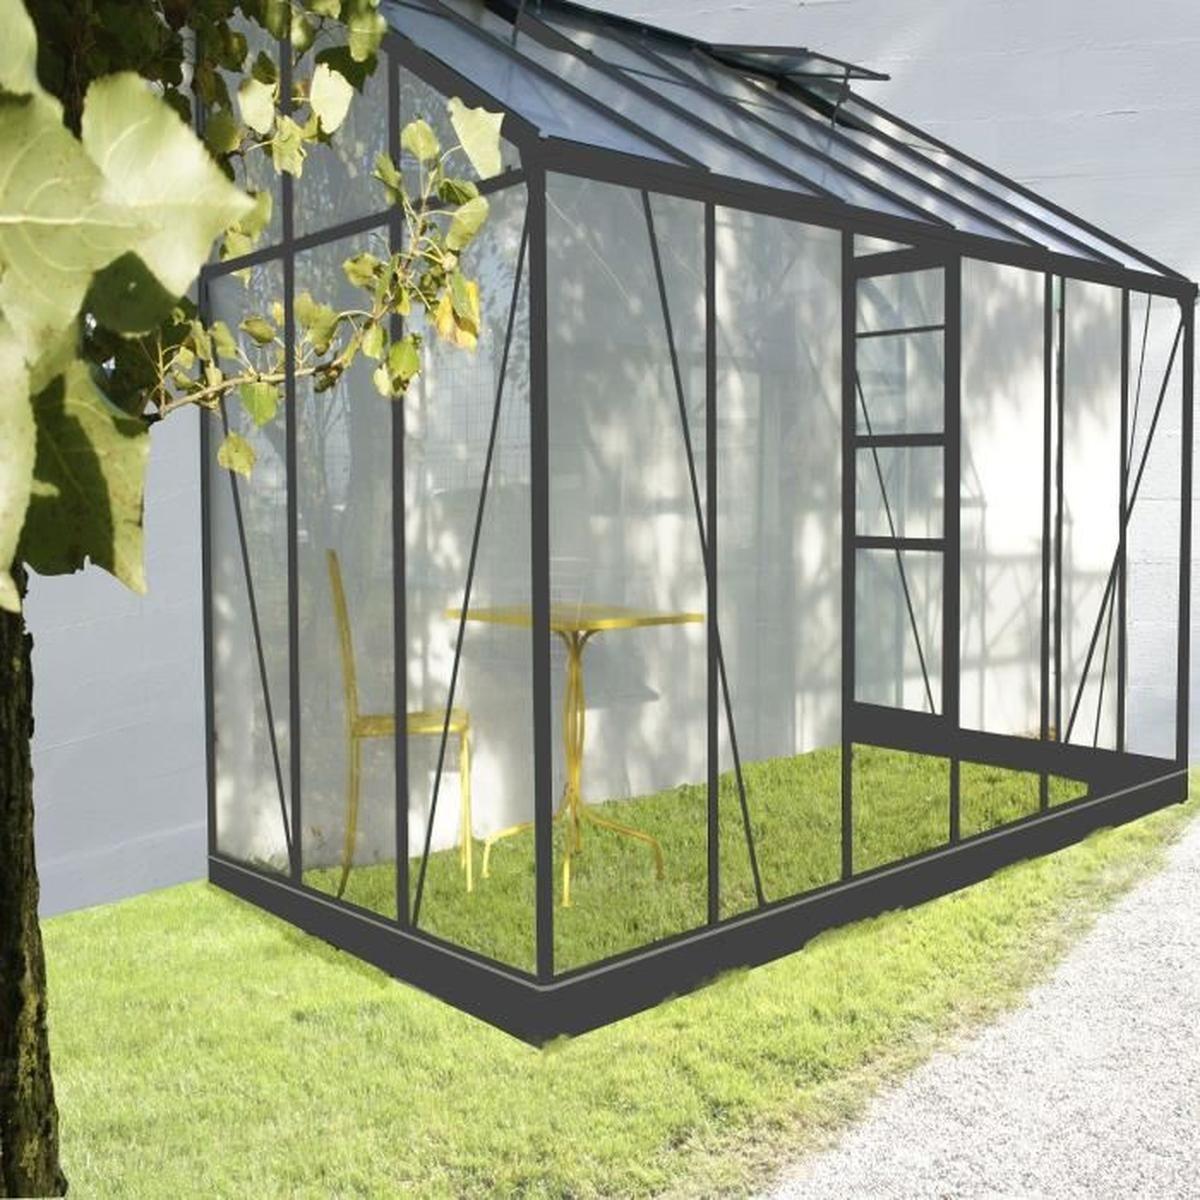 Serre Serre Solarium Adossée De 7,22M2 De Surface En Verre ... intérieur Serre De Jardin Adossee Solde Promotions